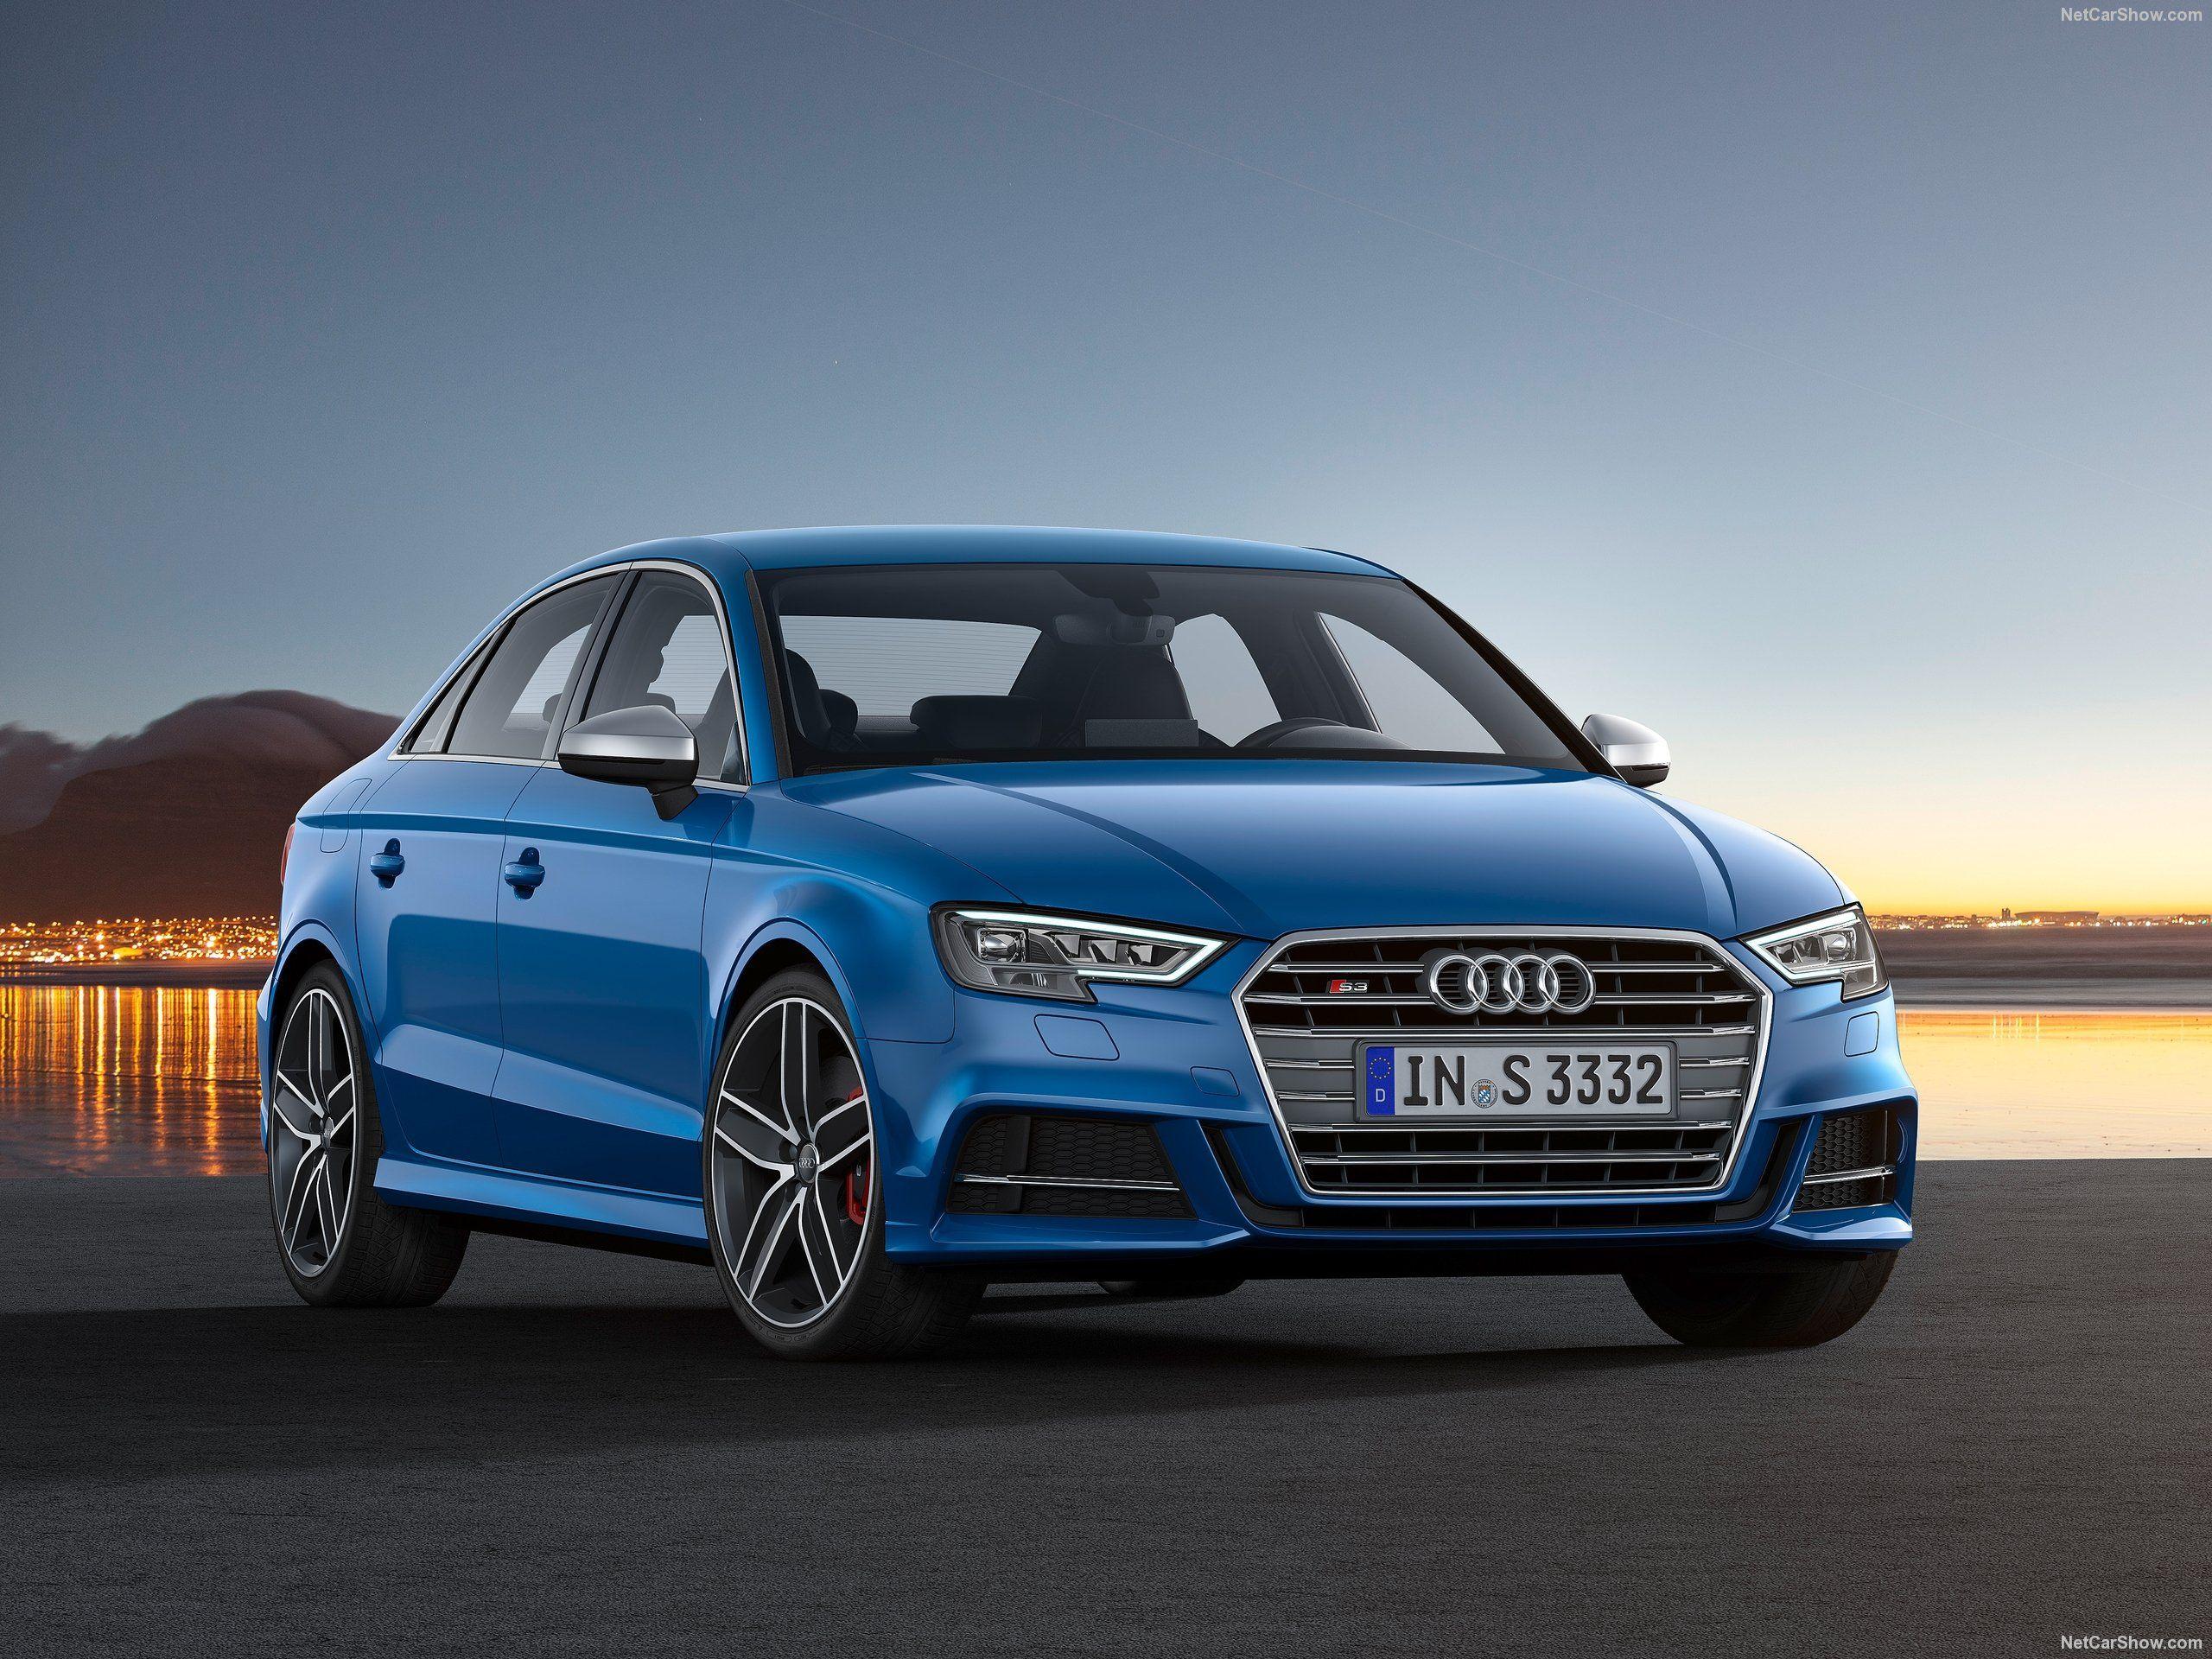 2017 Audi S3 Review audi s3 review